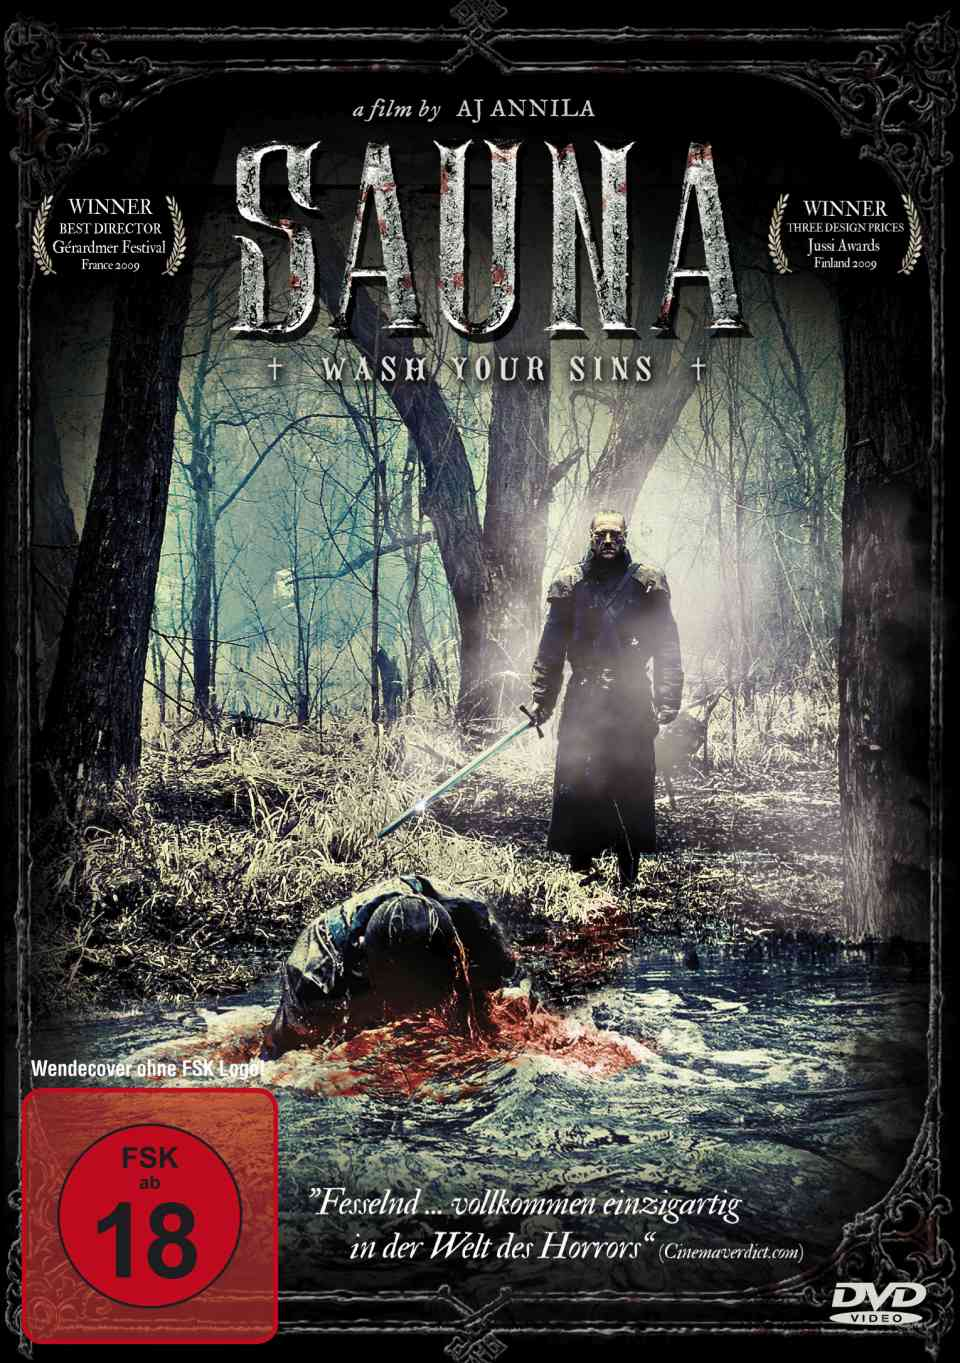 sauna film 2008 scary. Black Bedroom Furniture Sets. Home Design Ideas